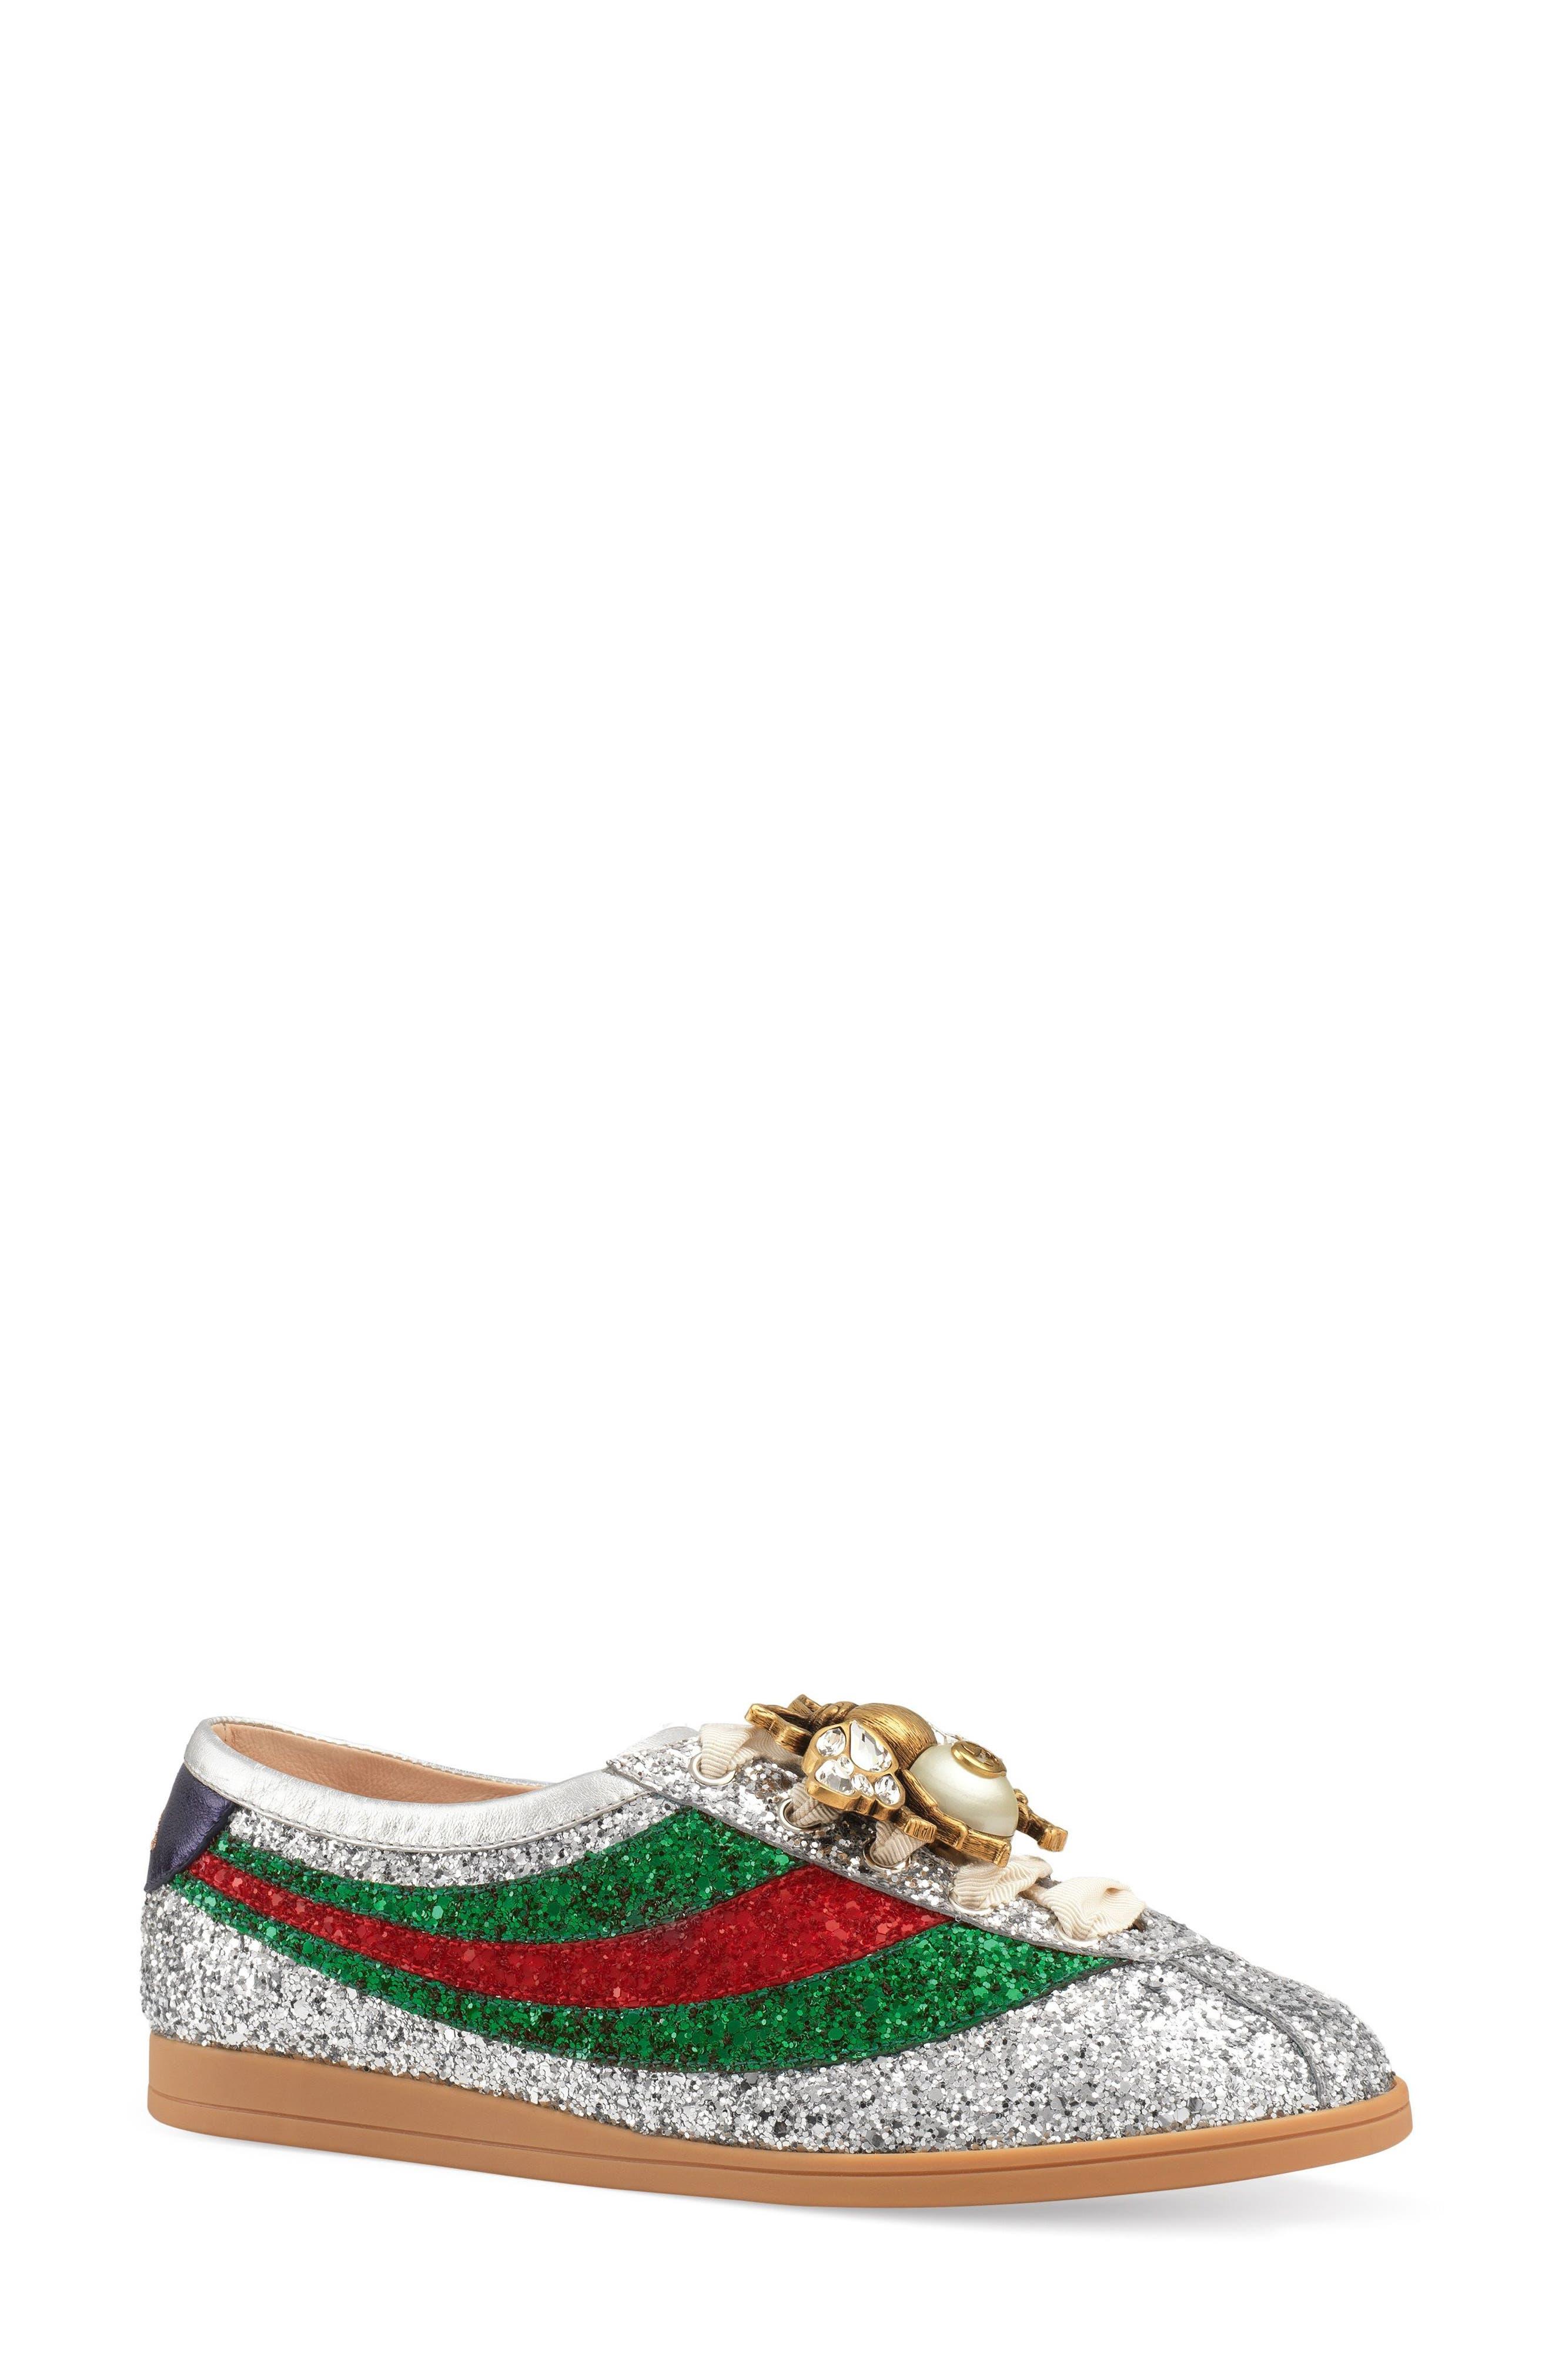 Falacer Glitter Sneaker,                             Main thumbnail 1, color,                             040